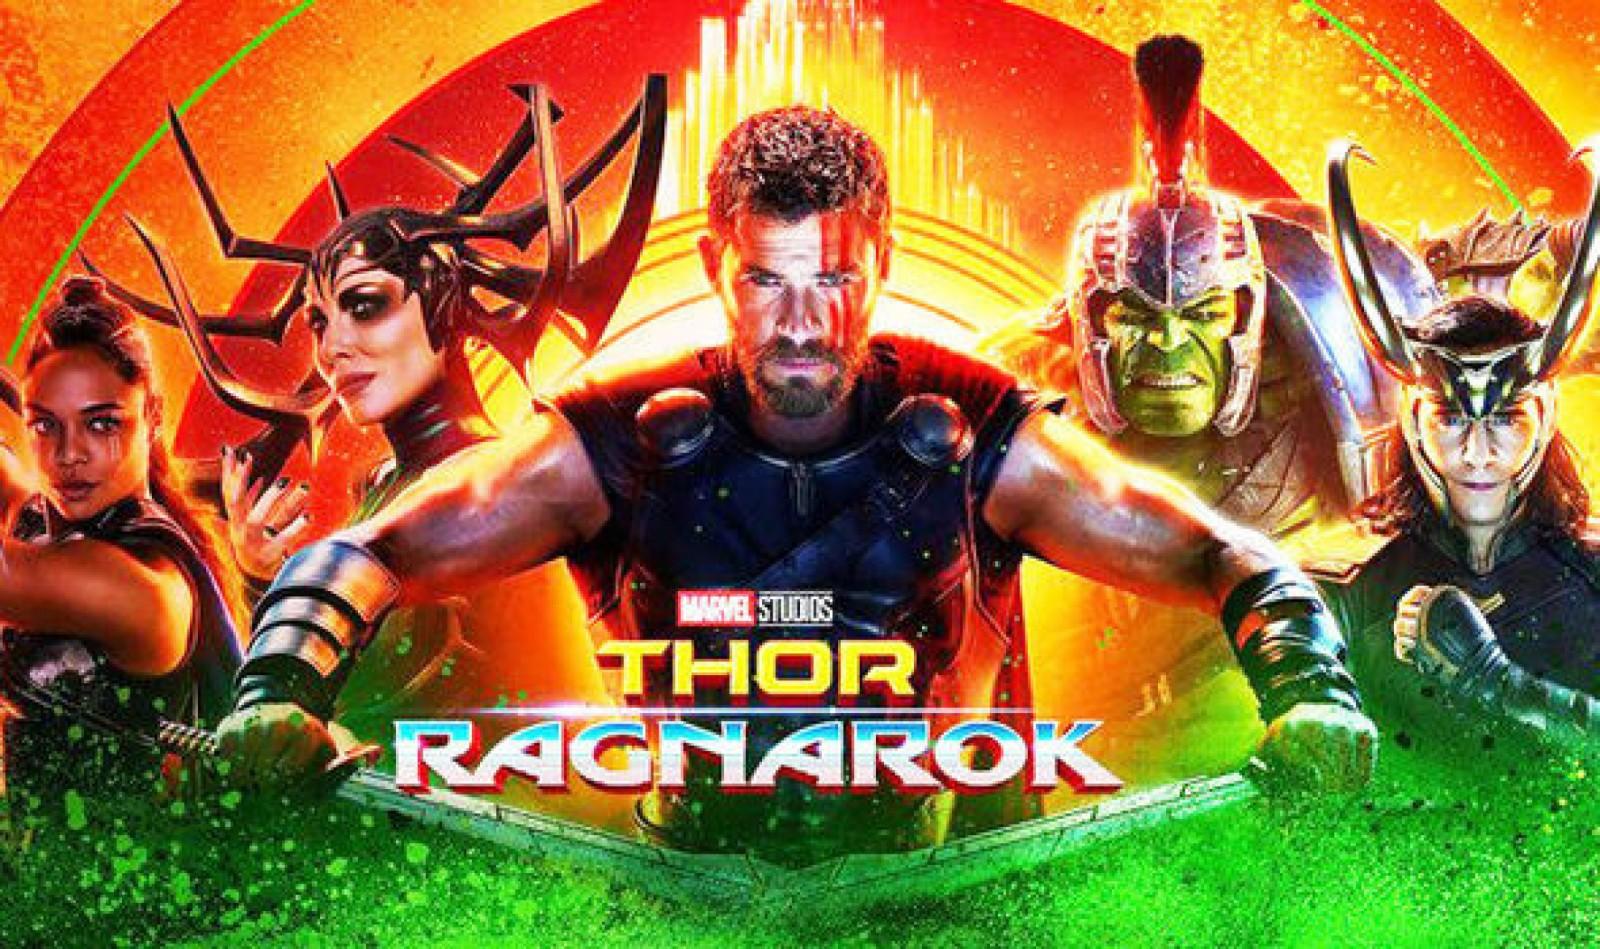 thor-ragnarok-end-credits-avengers-infinity-war-870508.jpg